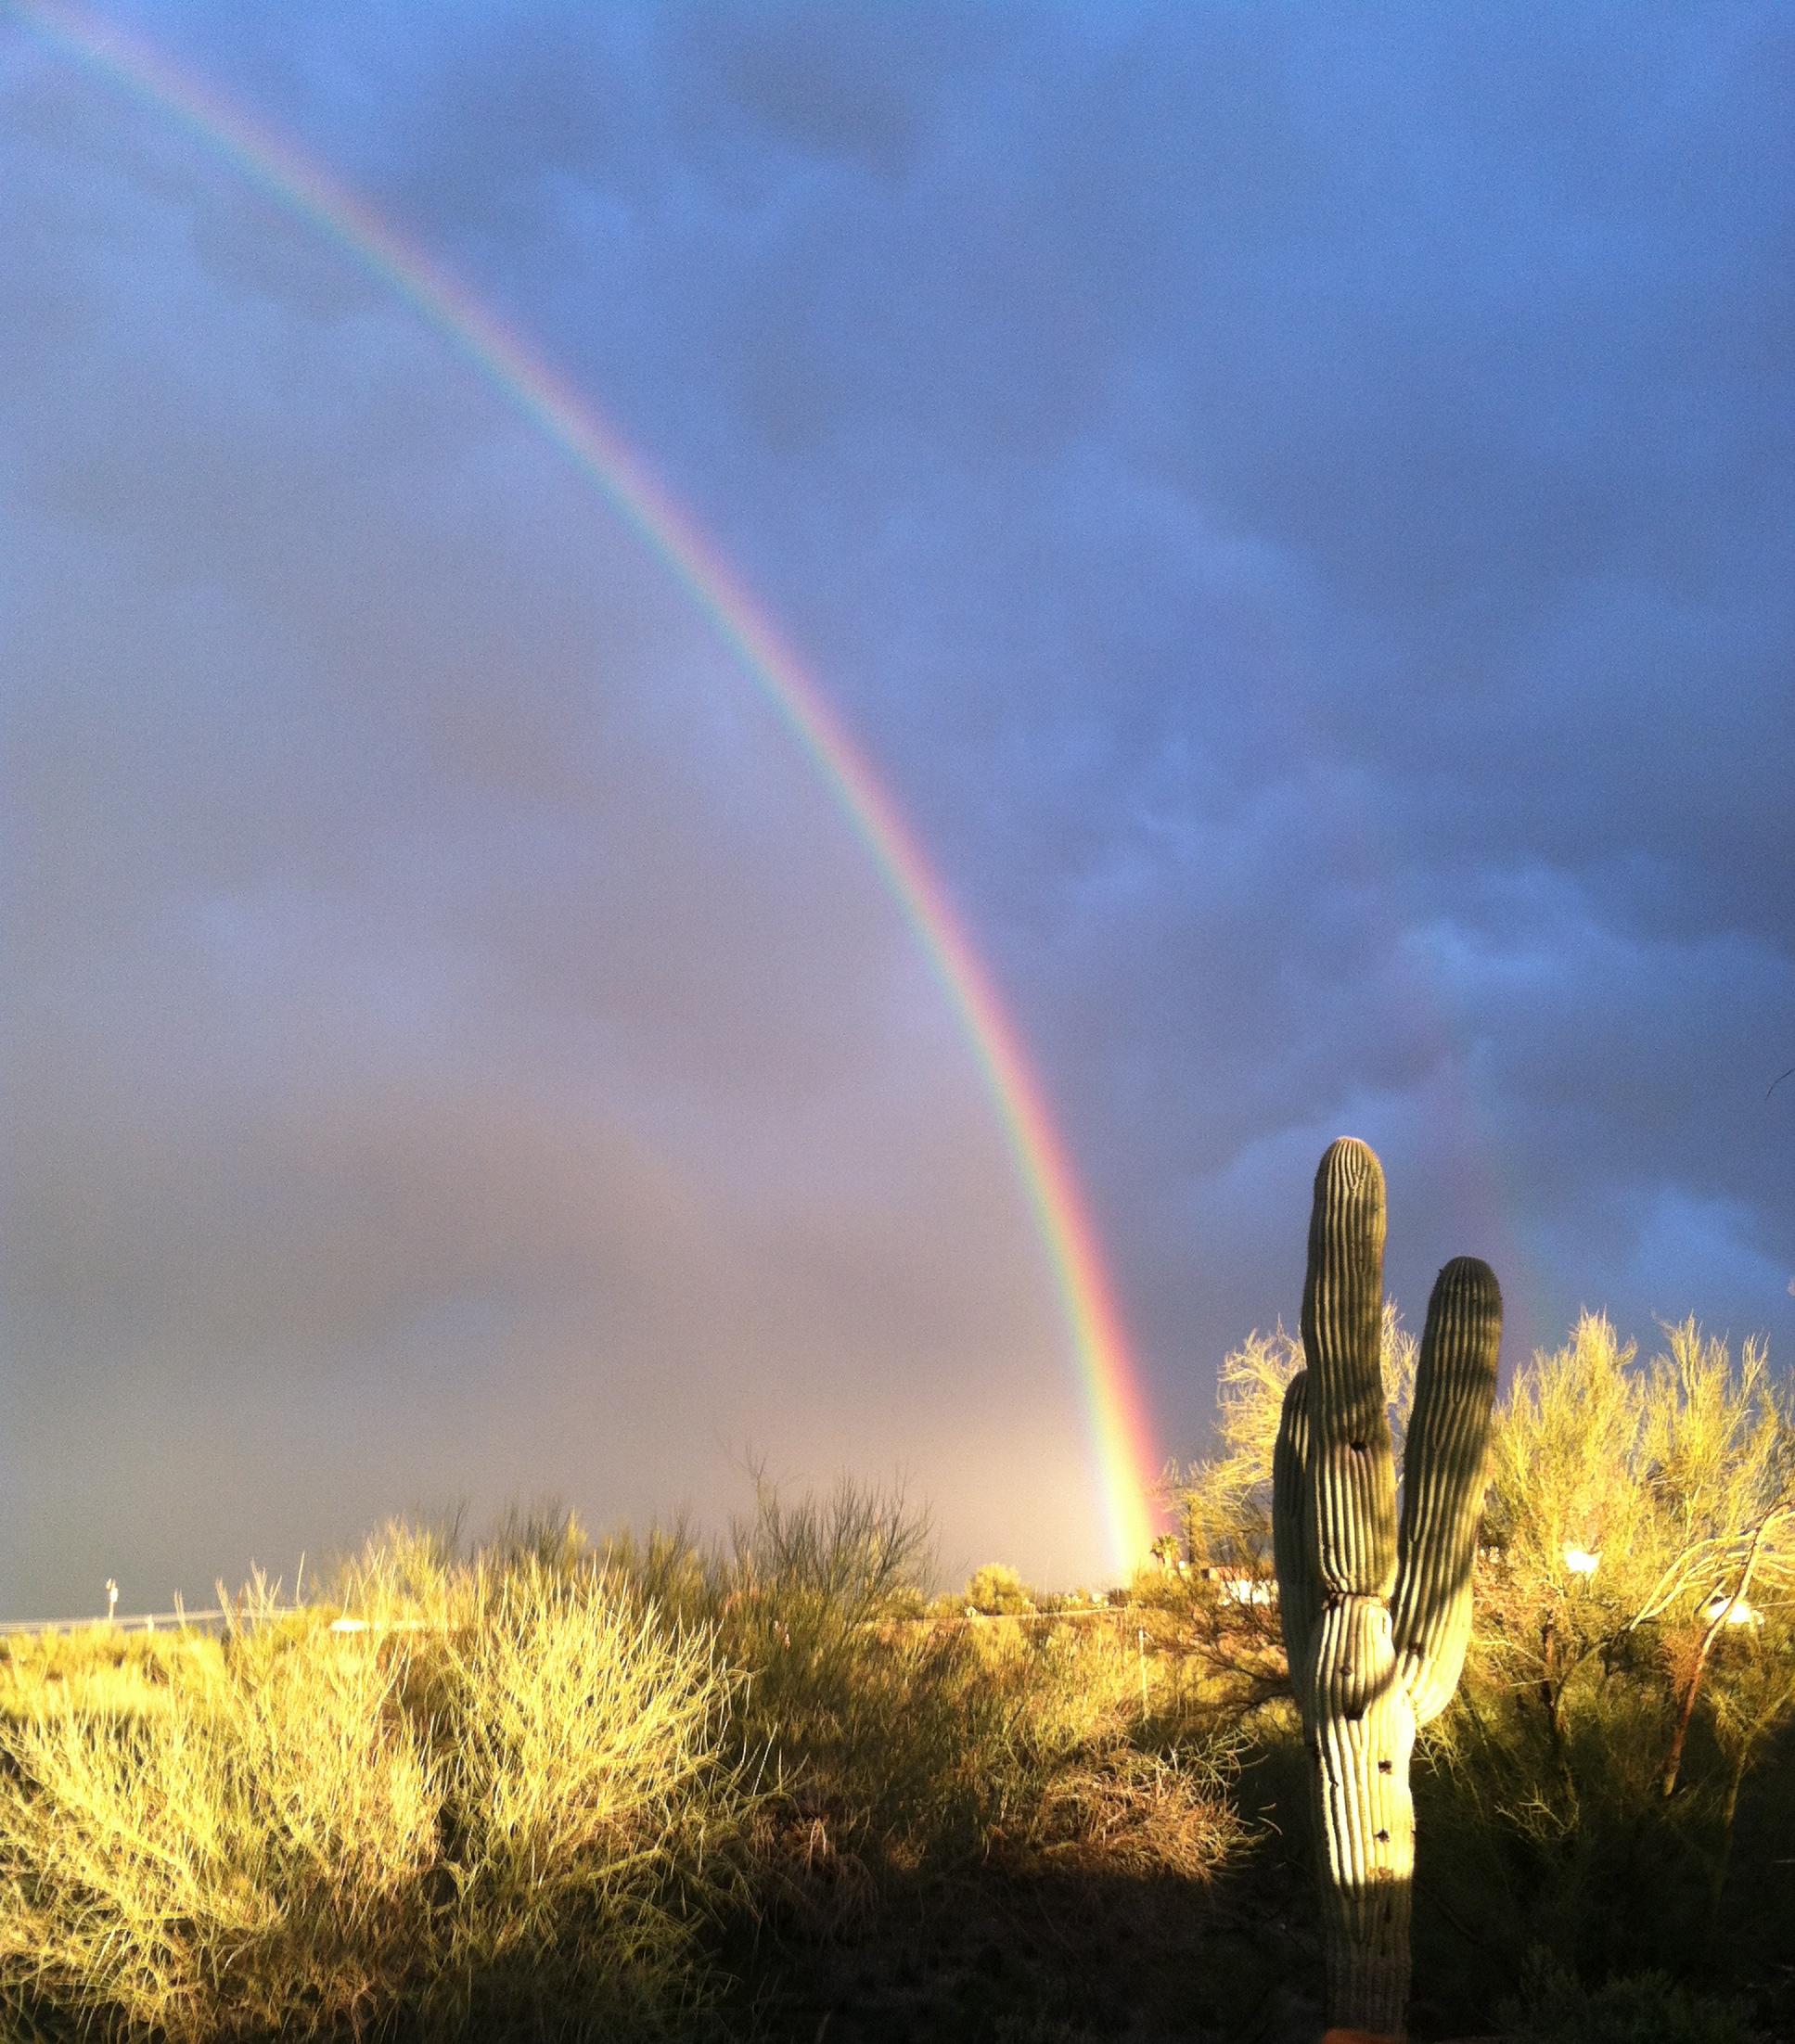 cactus rainbow full frame.JPG